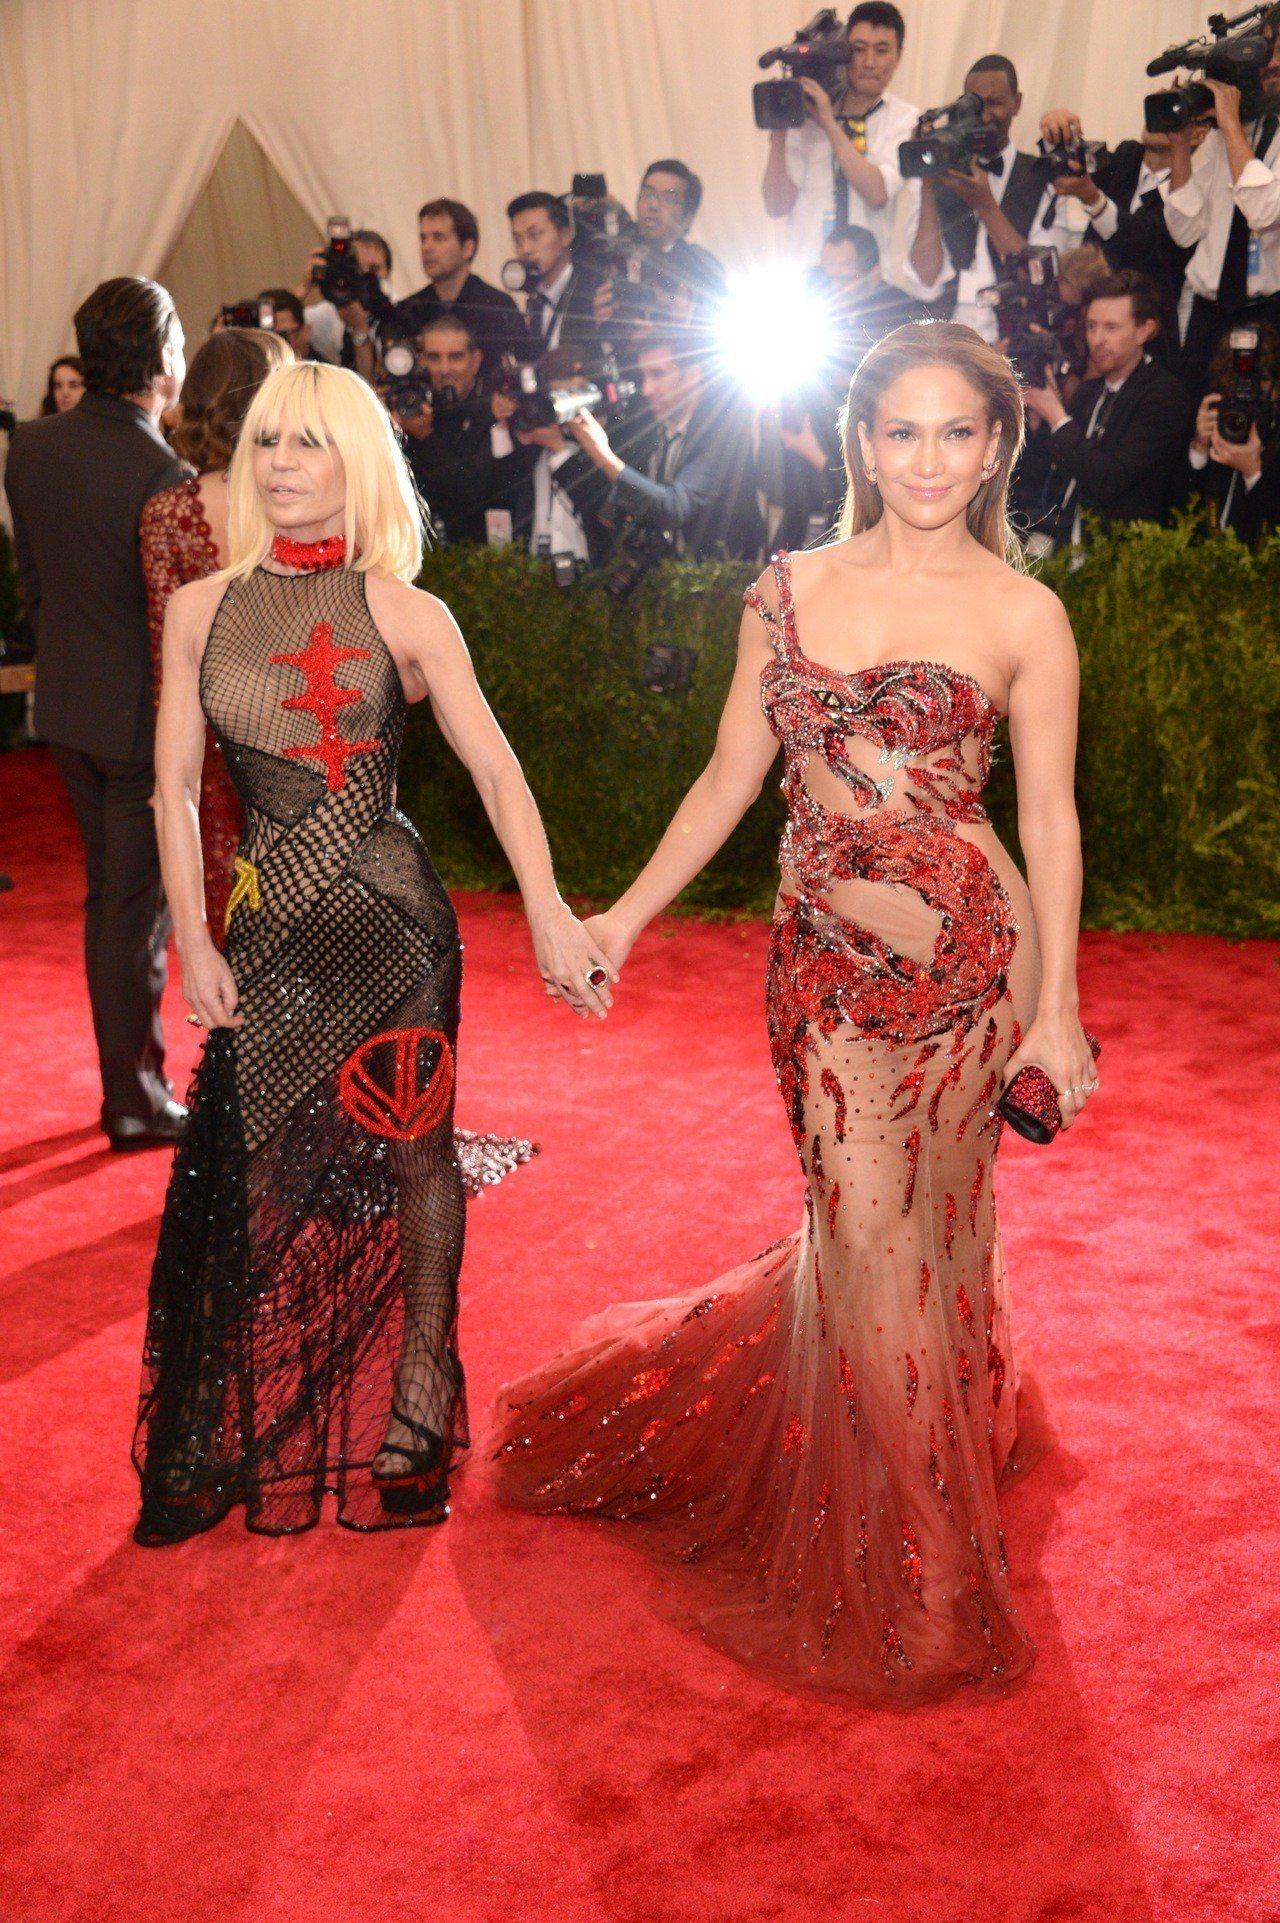 J-Lo選穿出自Versace的火紅的龍圖騰刺繡搭配薄紗禮服,整體鏤空設計非常誘...